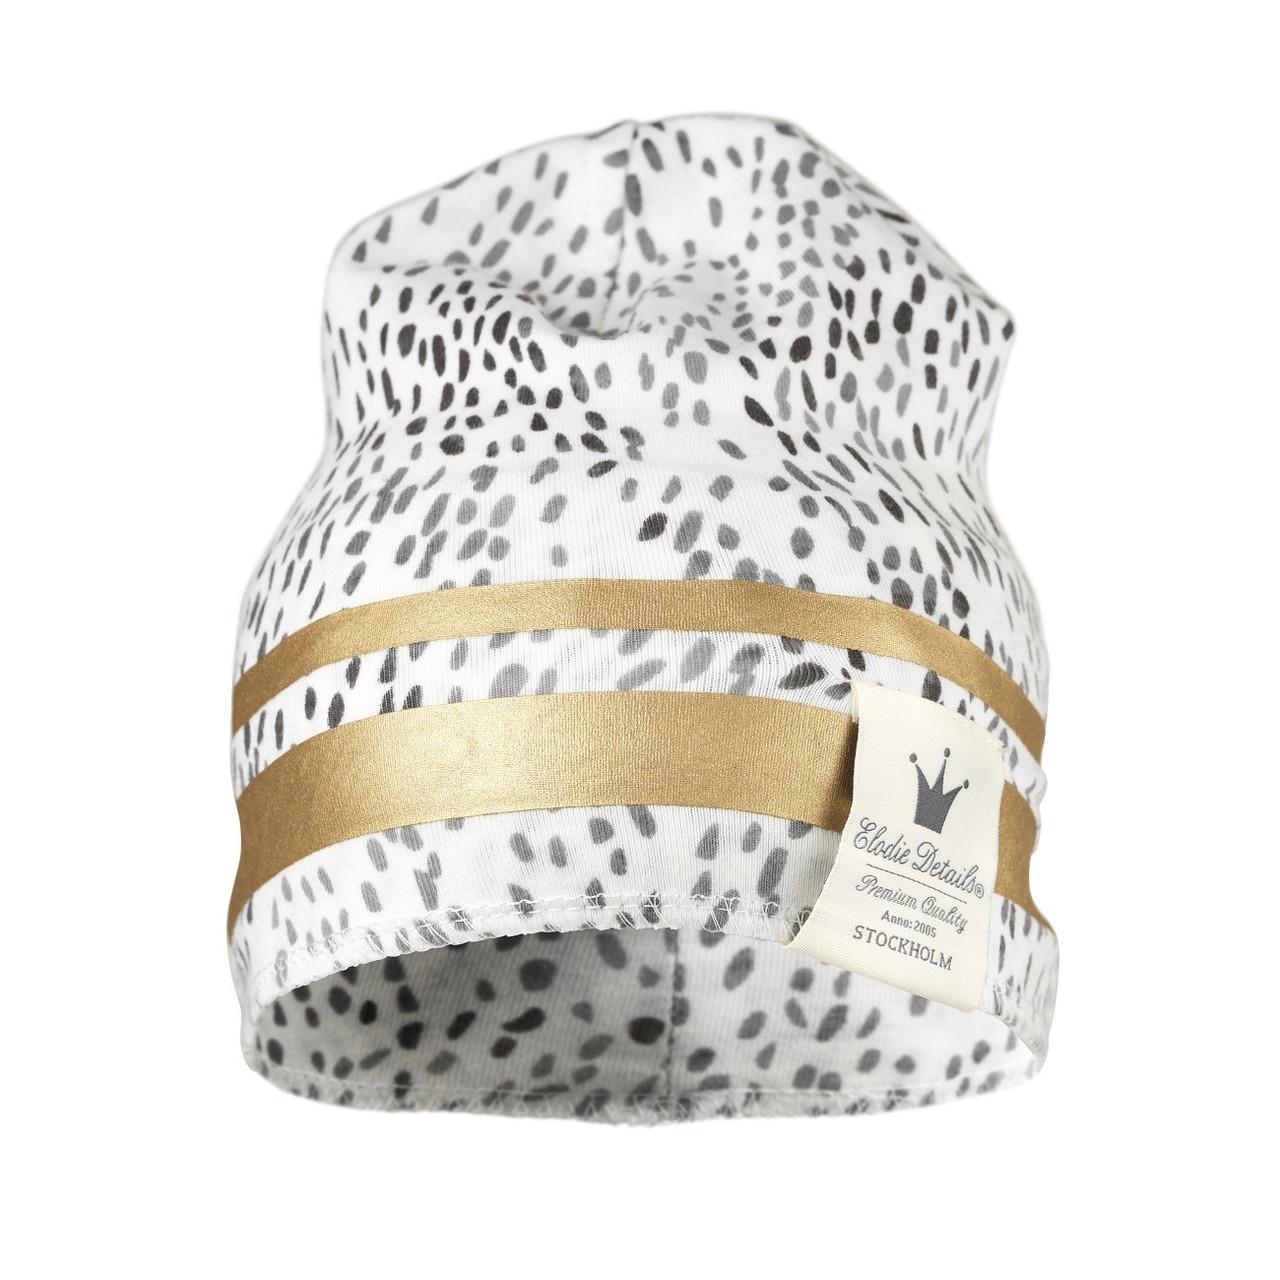 Детская теплая шапка Elodie Details - Gilded Dots of Fauna, 6-12 m